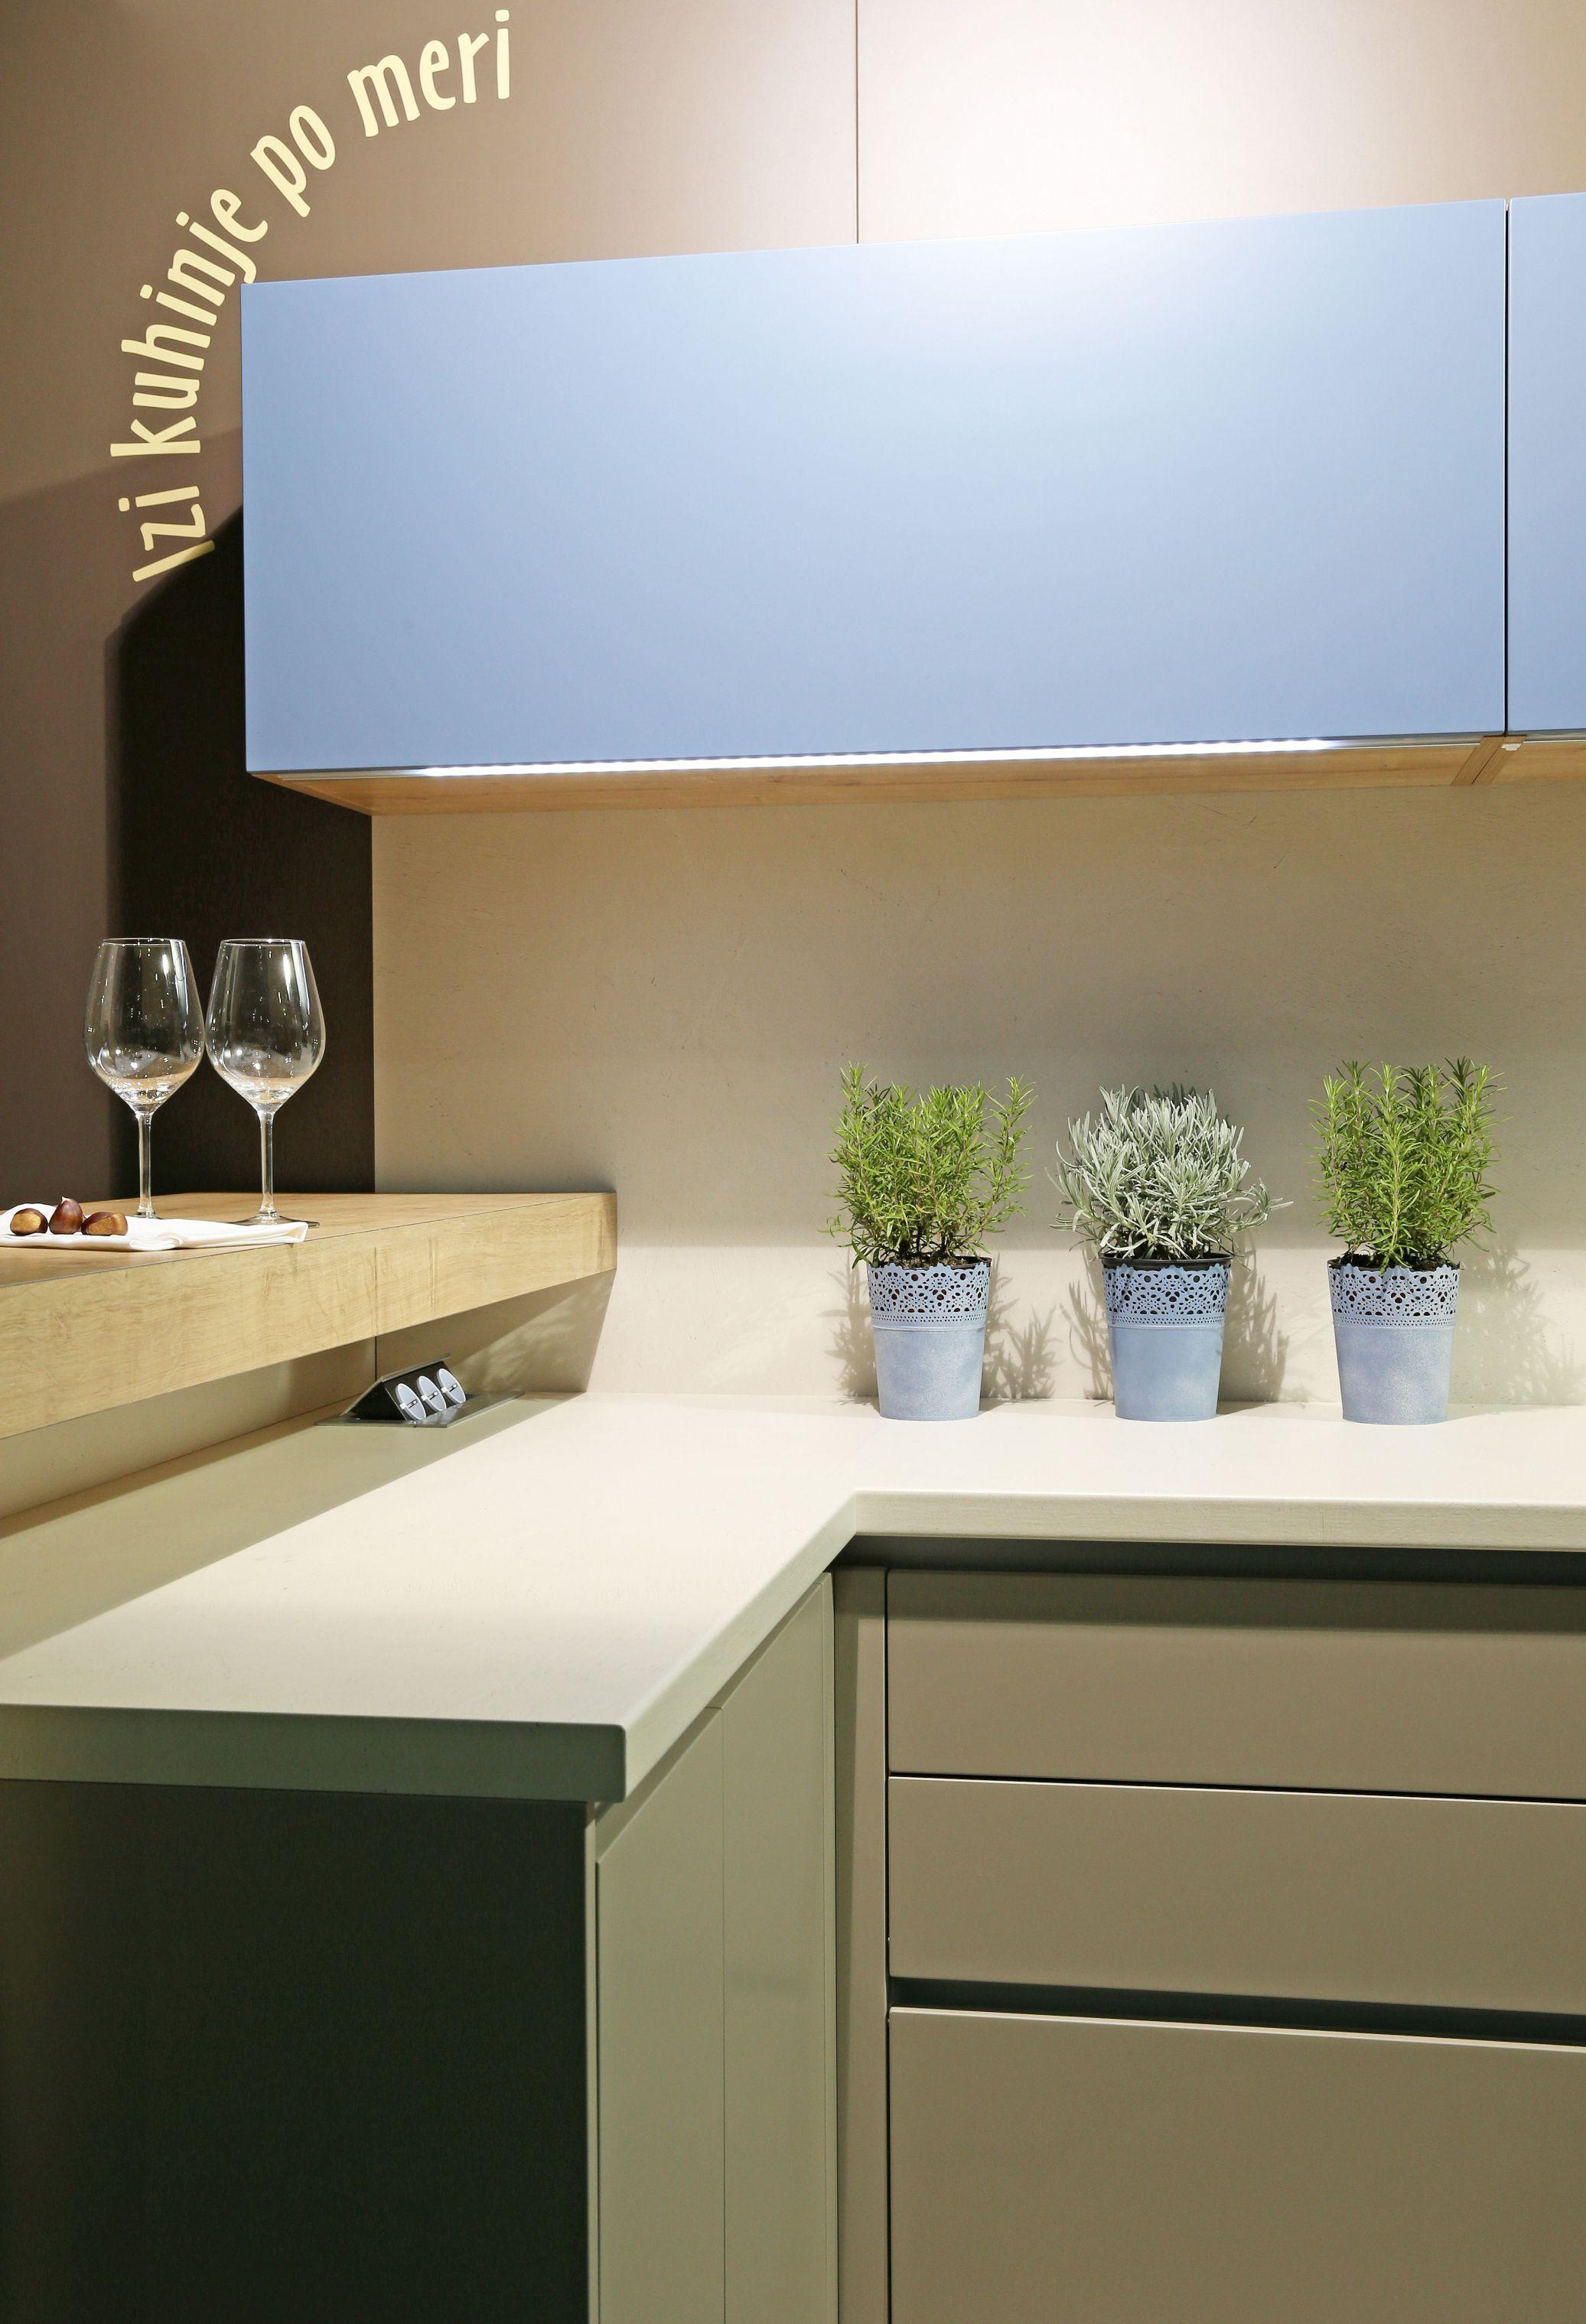 kuhinje po meri in kuhinjsko pohi tvo najvi je kvalitete izi mobili. Black Bedroom Furniture Sets. Home Design Ideas